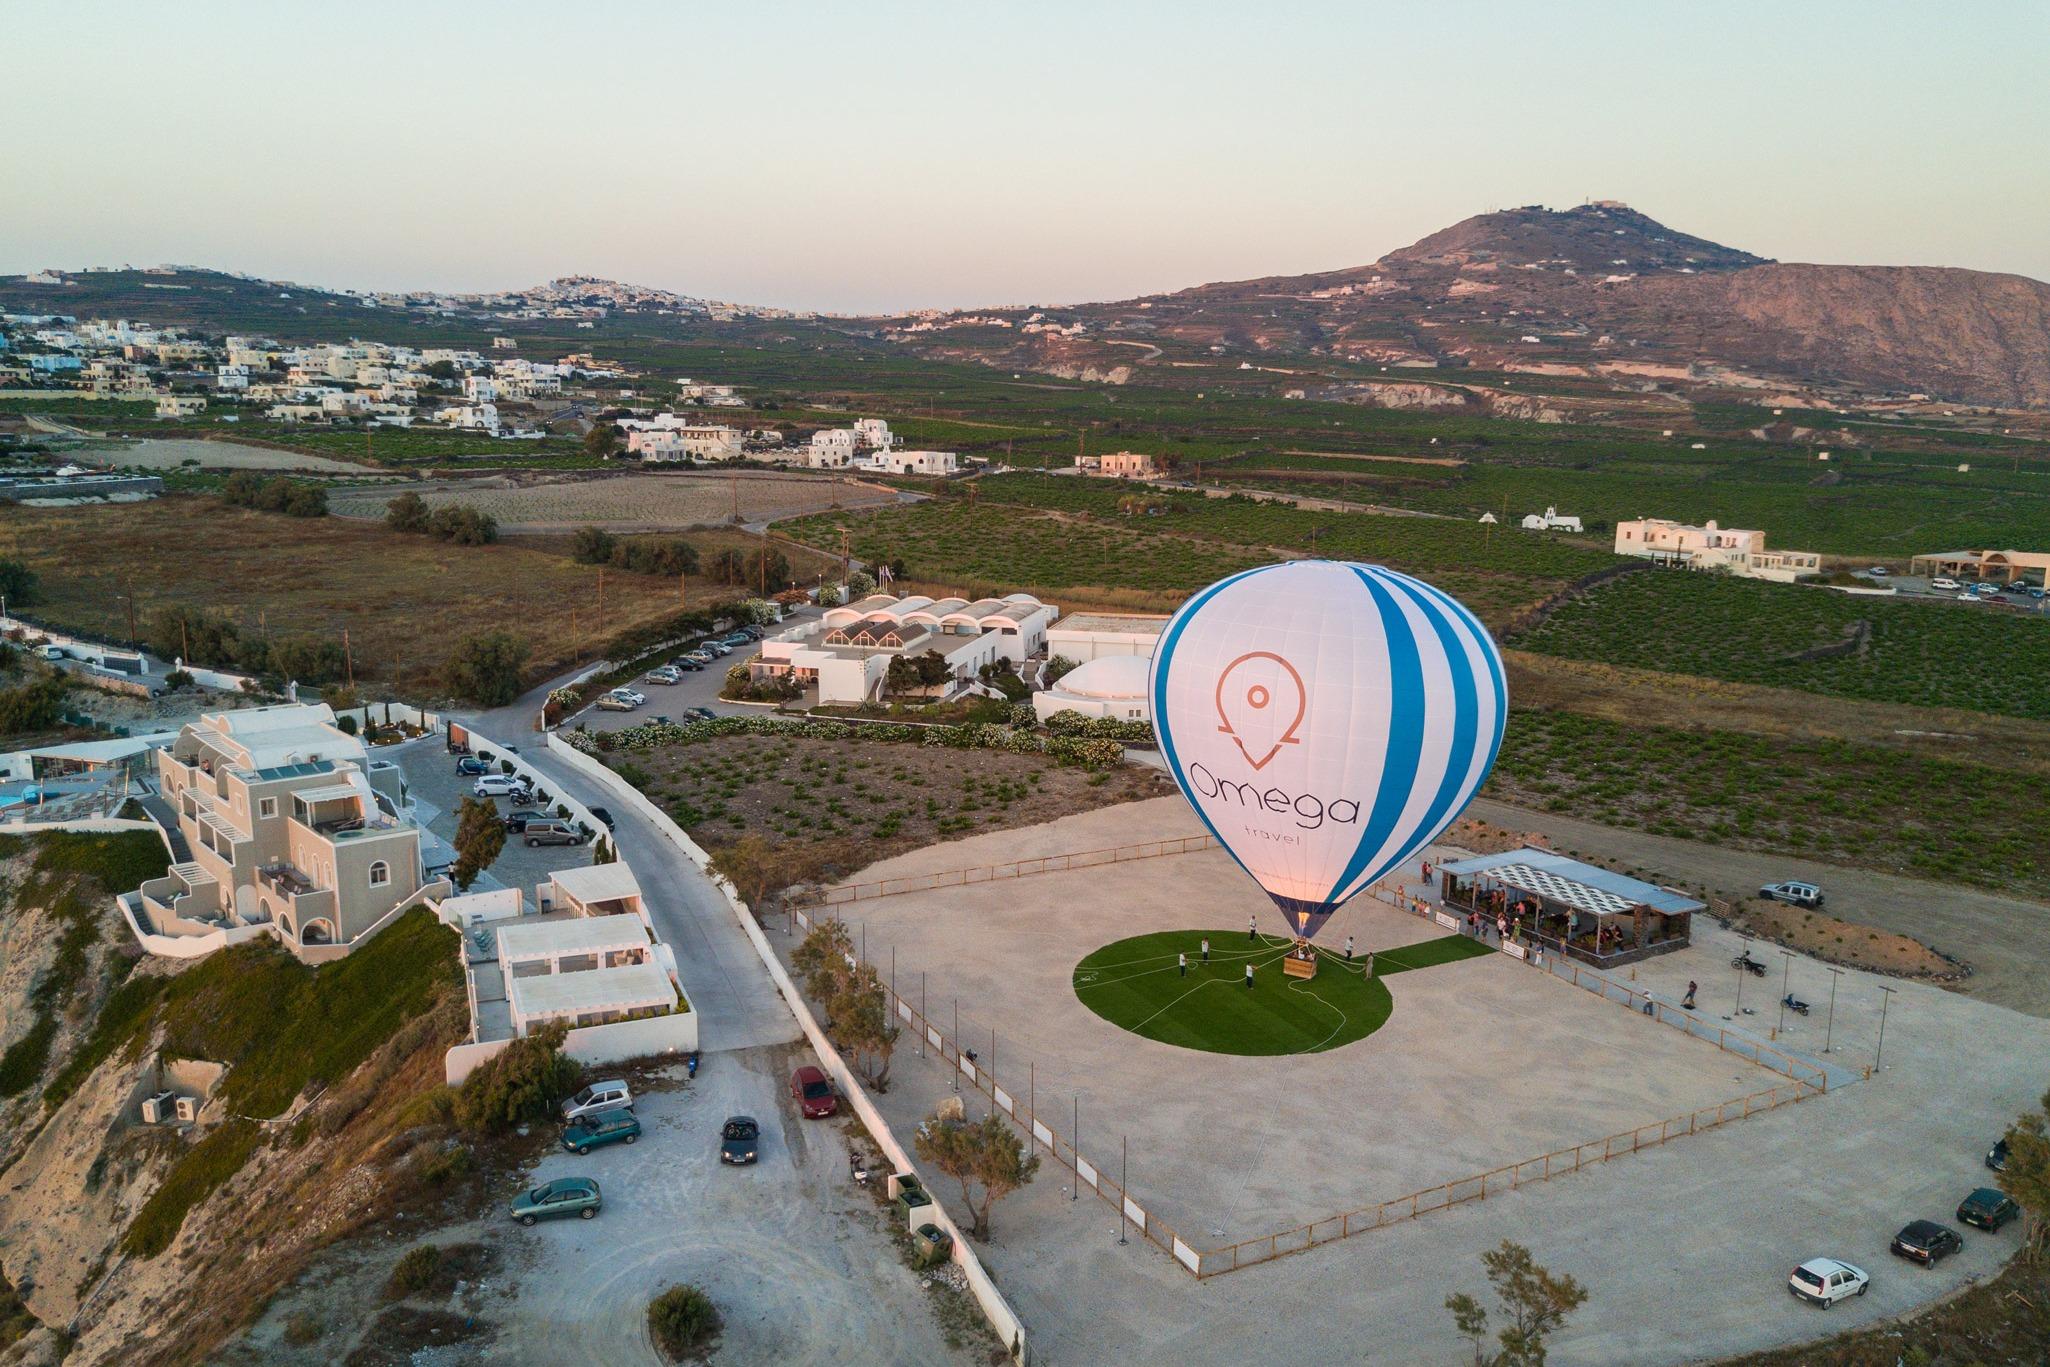 hot-air-balloon-ride-santorini